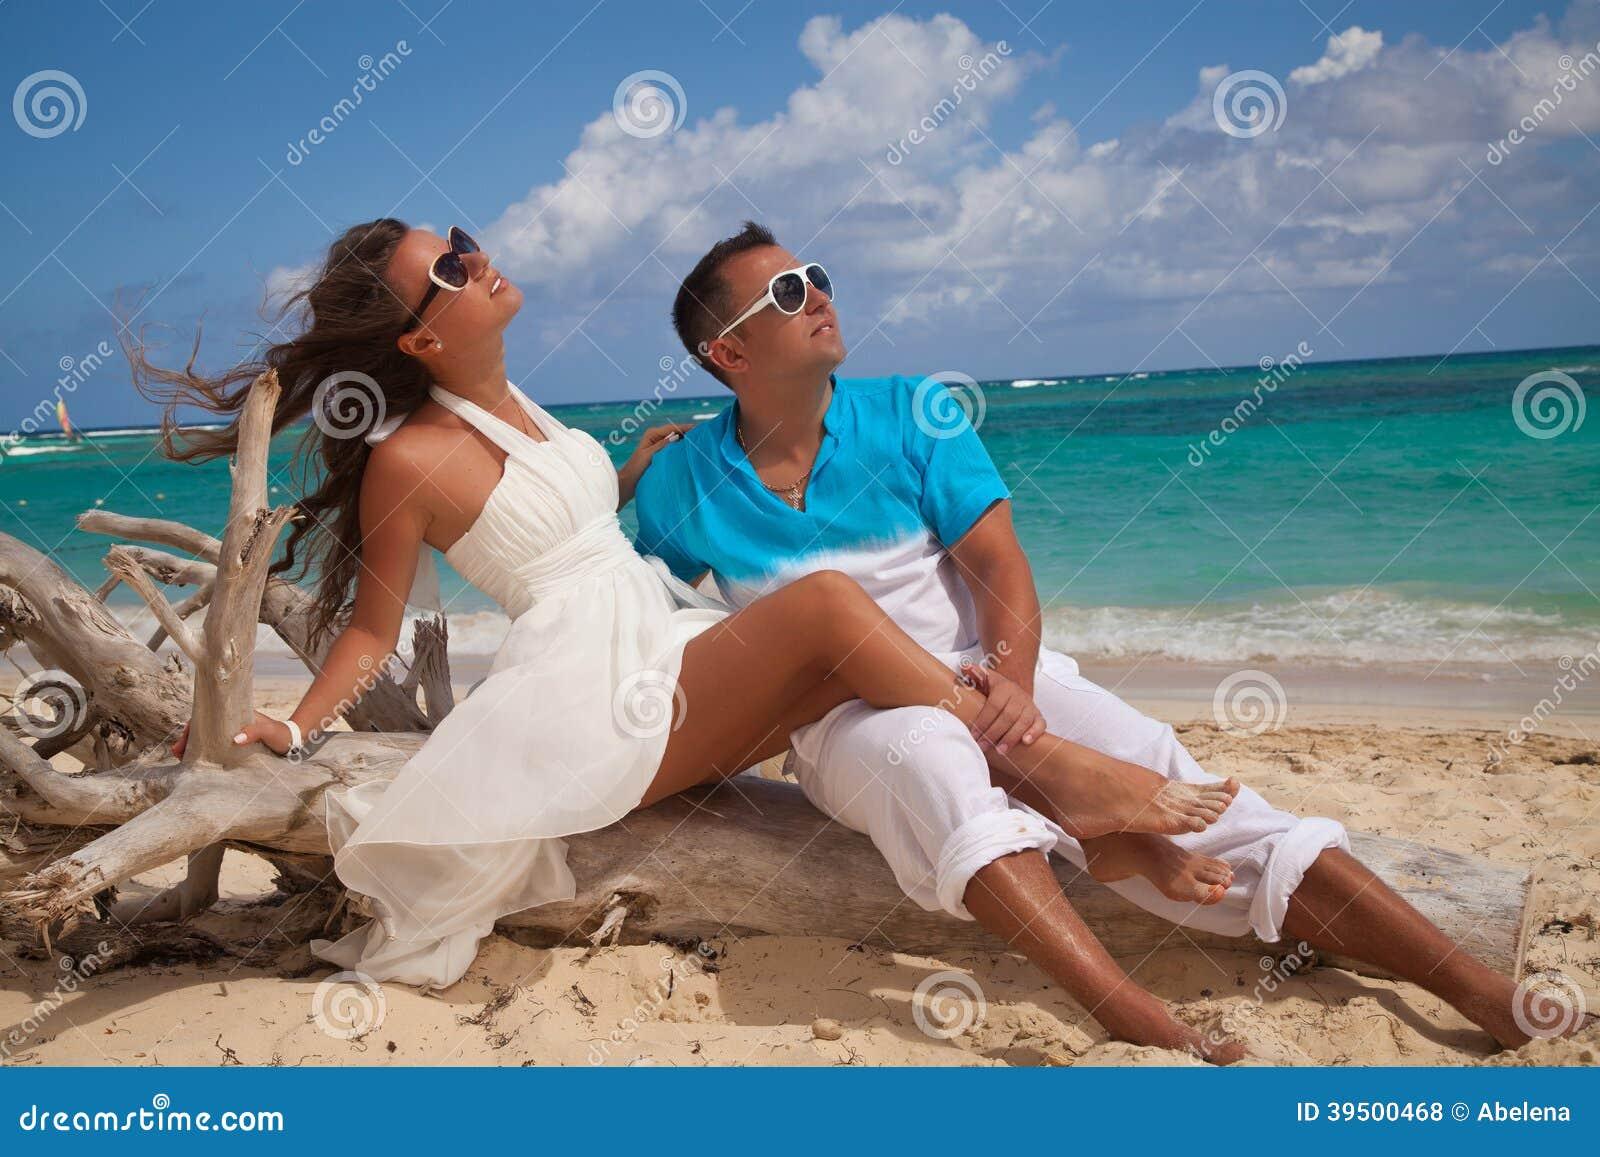 Happy Romantic Couple Enjoying Sunset at the Beach